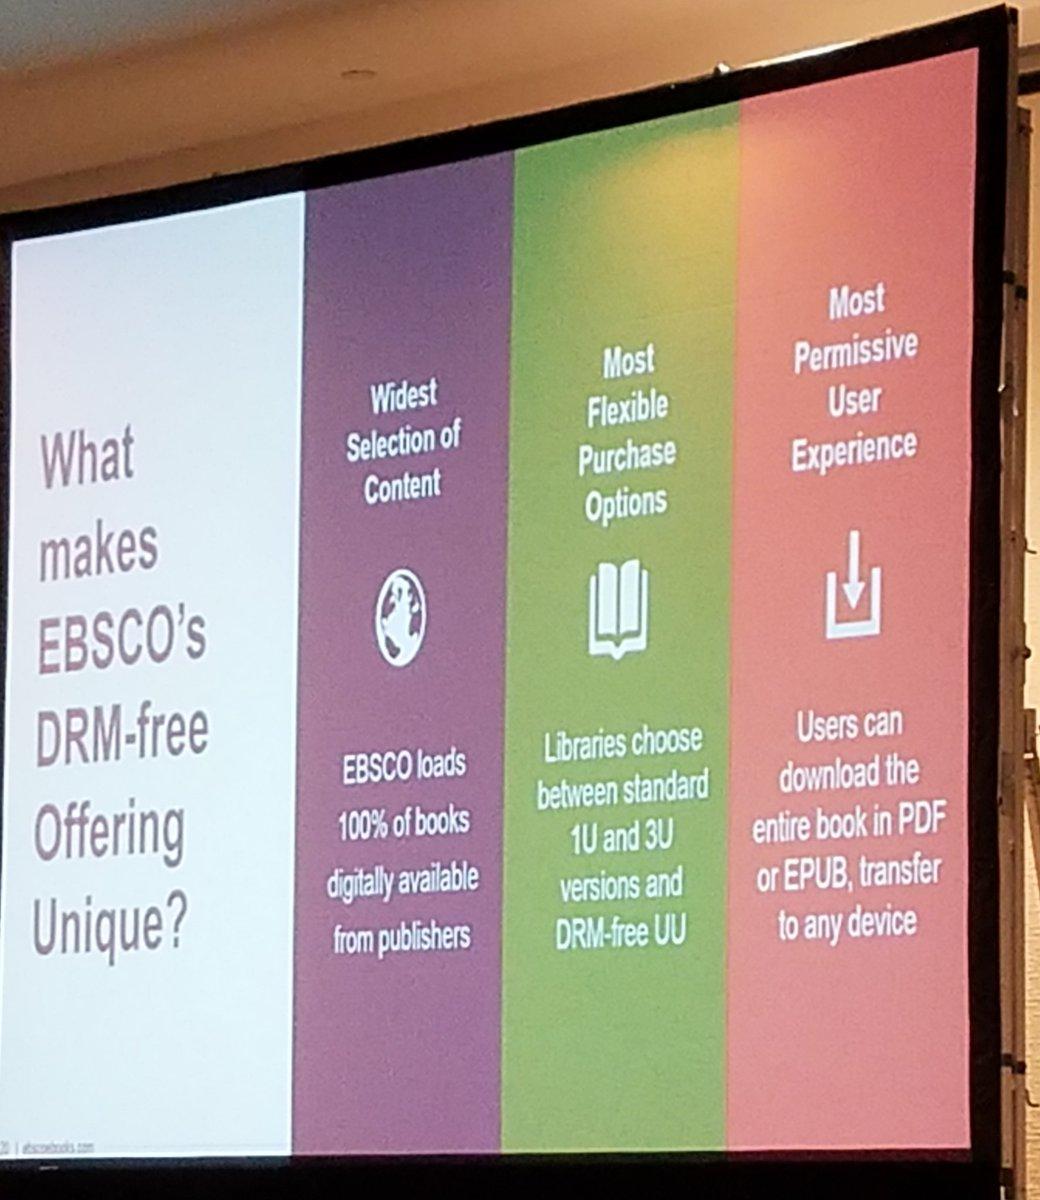 EBSCO on Twitter: